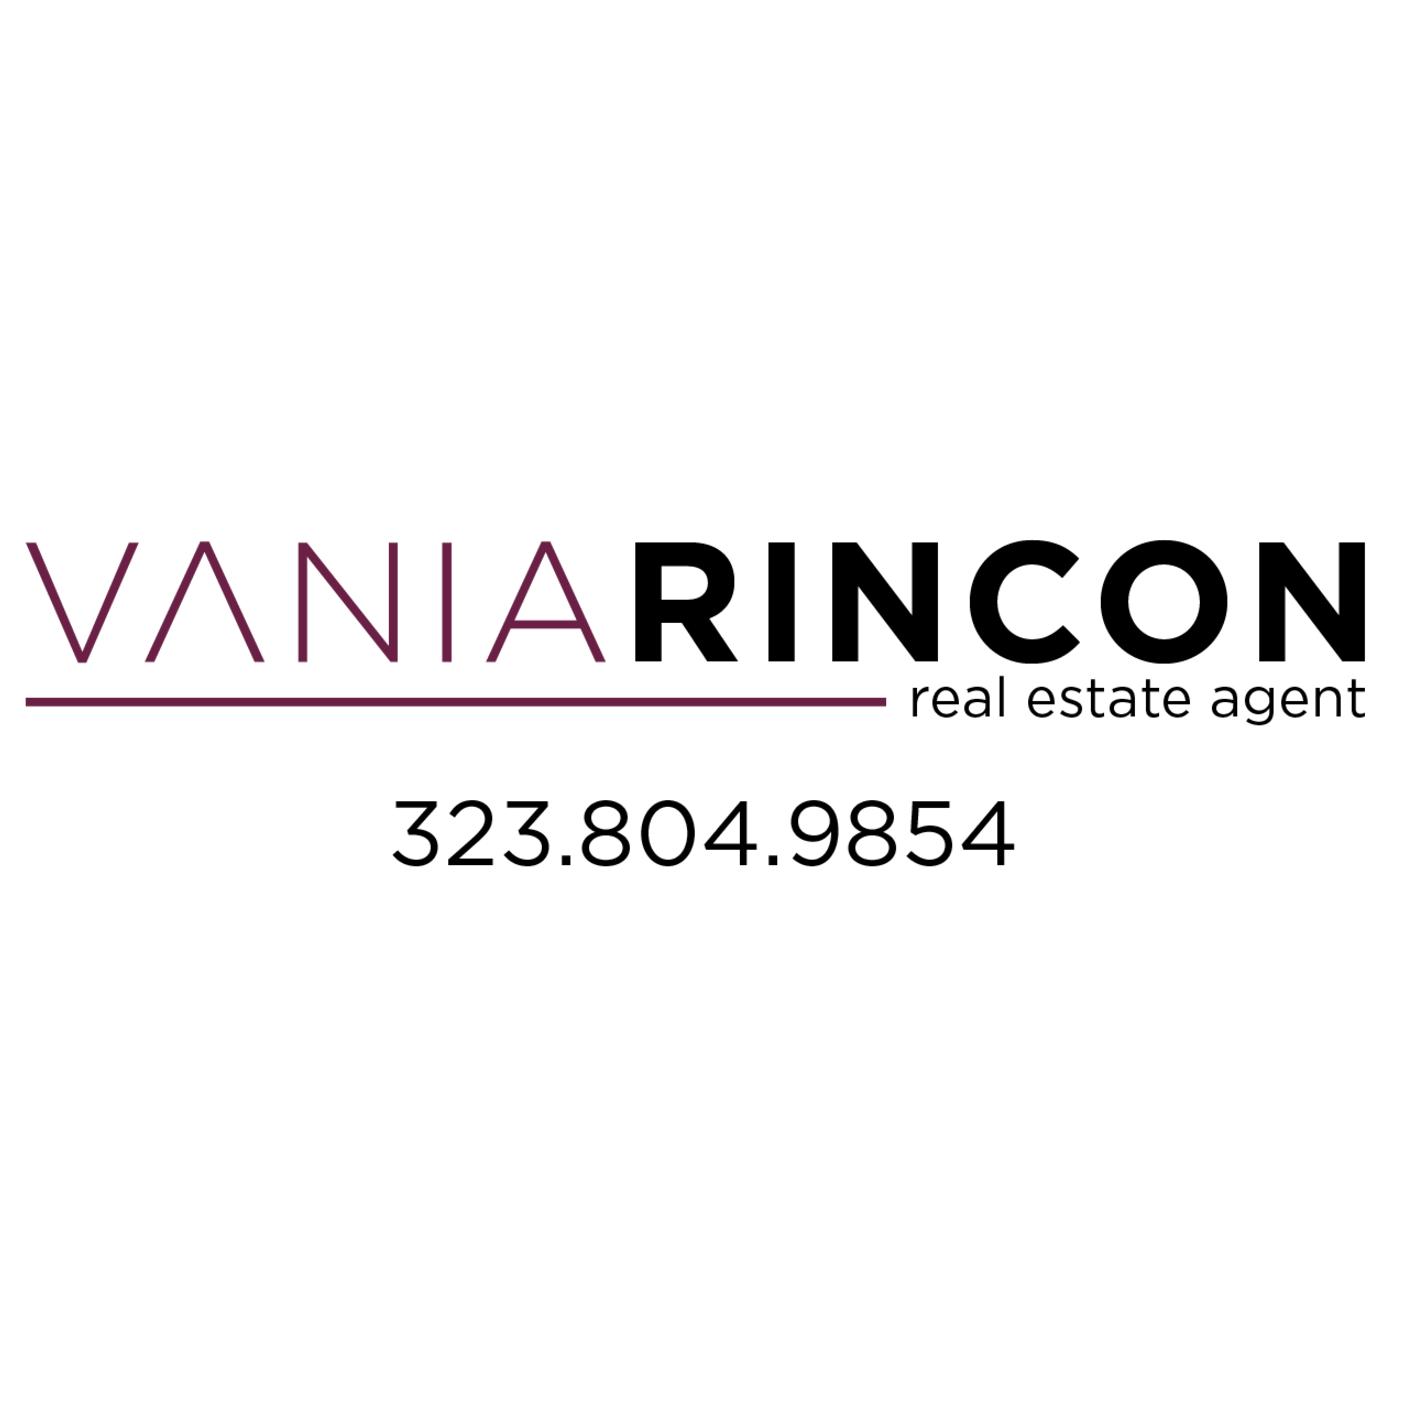 Vania Rincon | Keller Williams - Beverly Hills